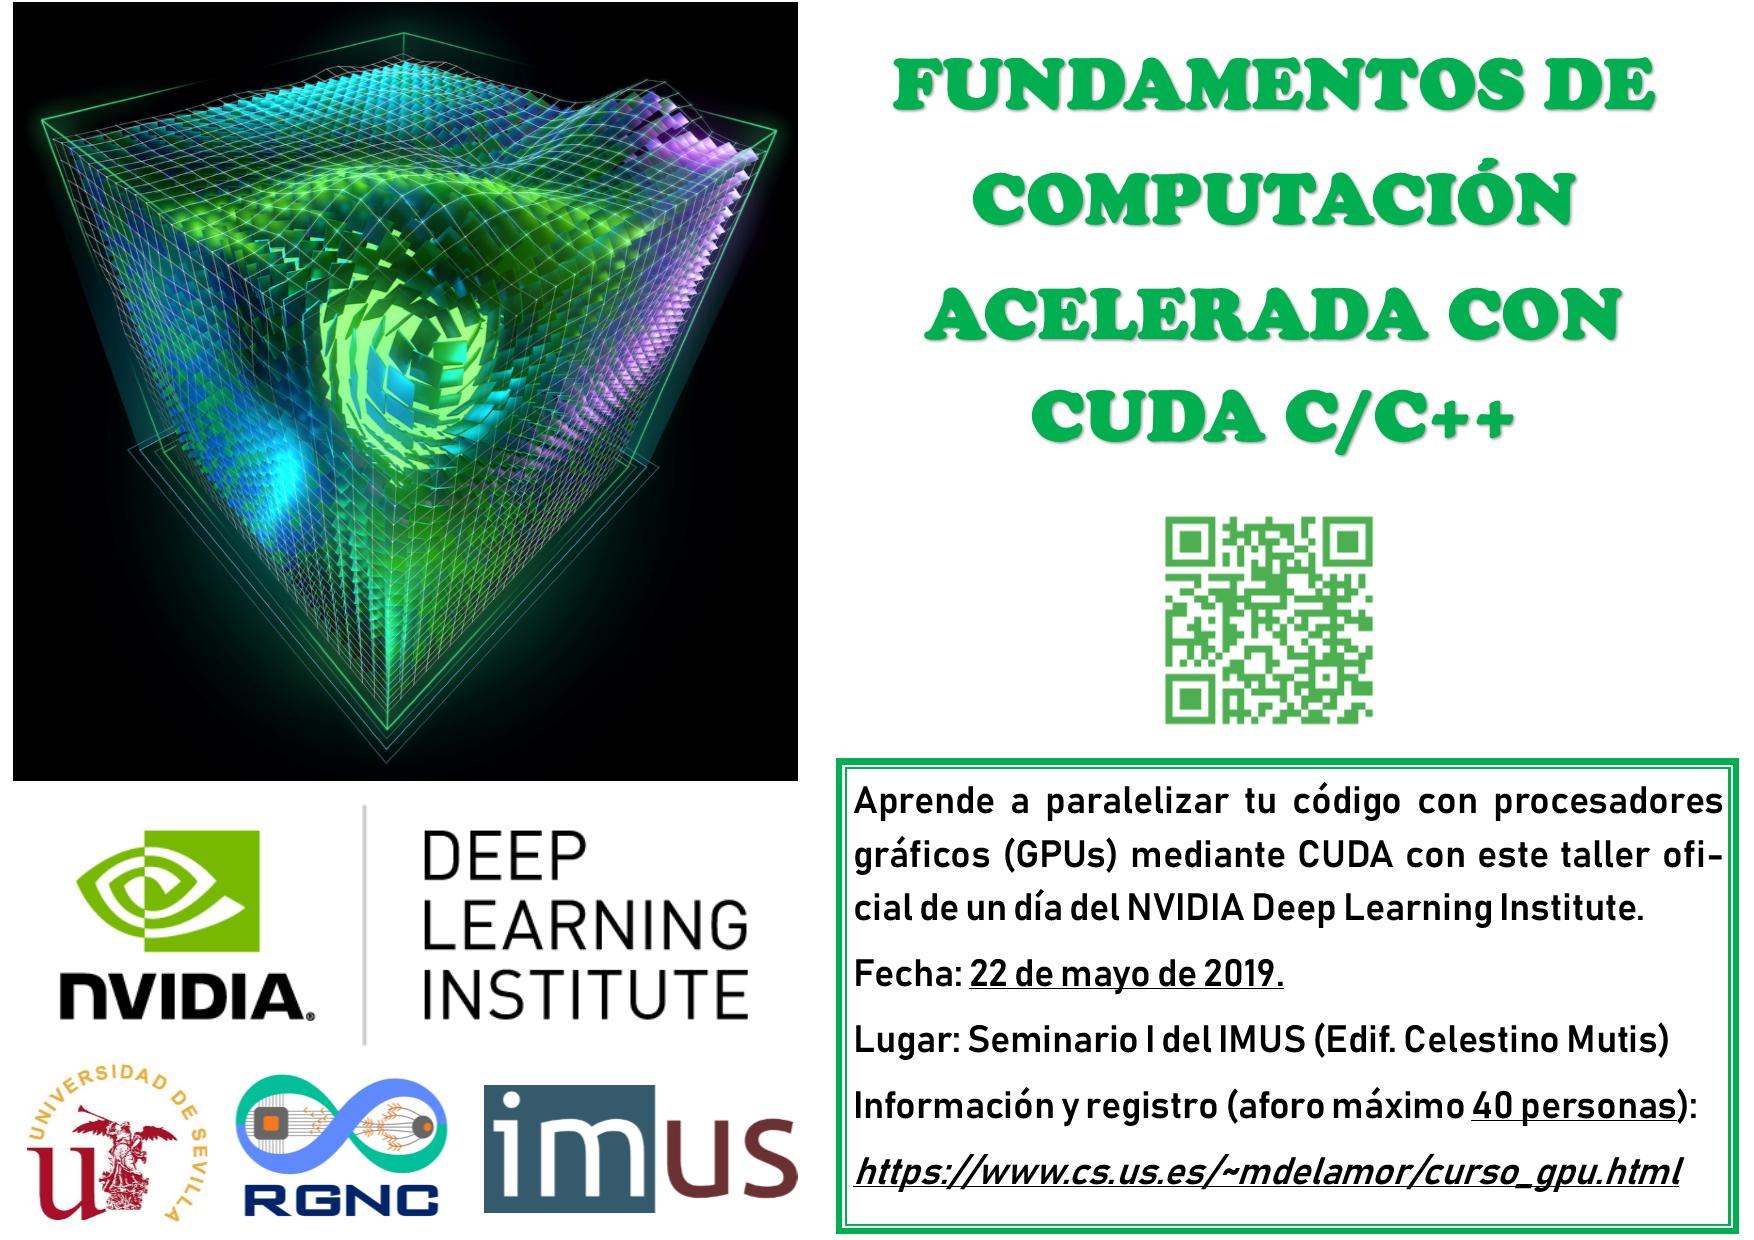 Fundamentals of Accelerated Computing with CUDA C/C++